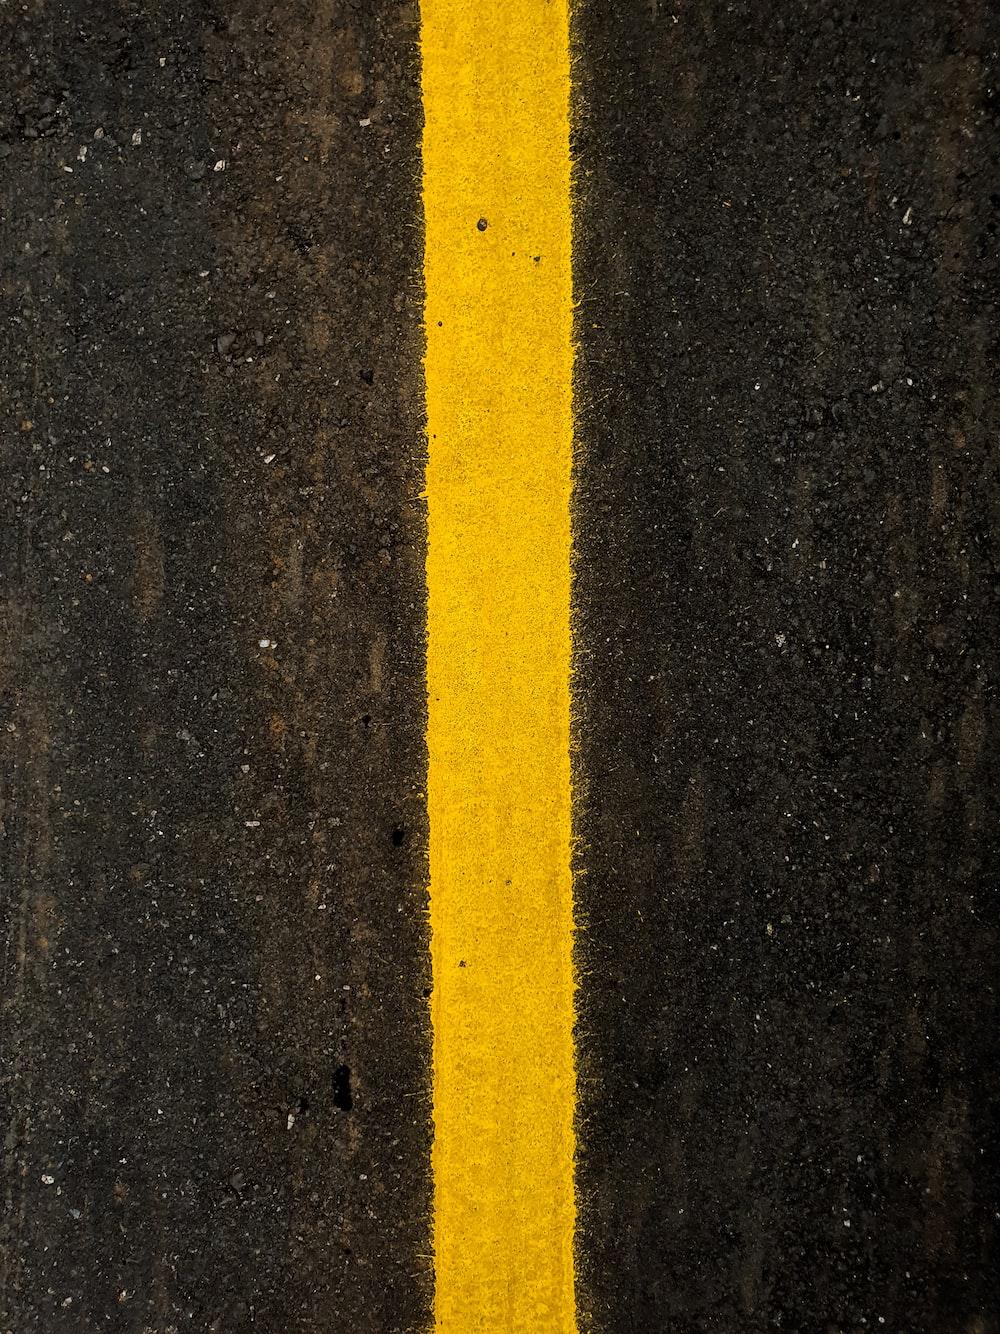 yellow line on black sand